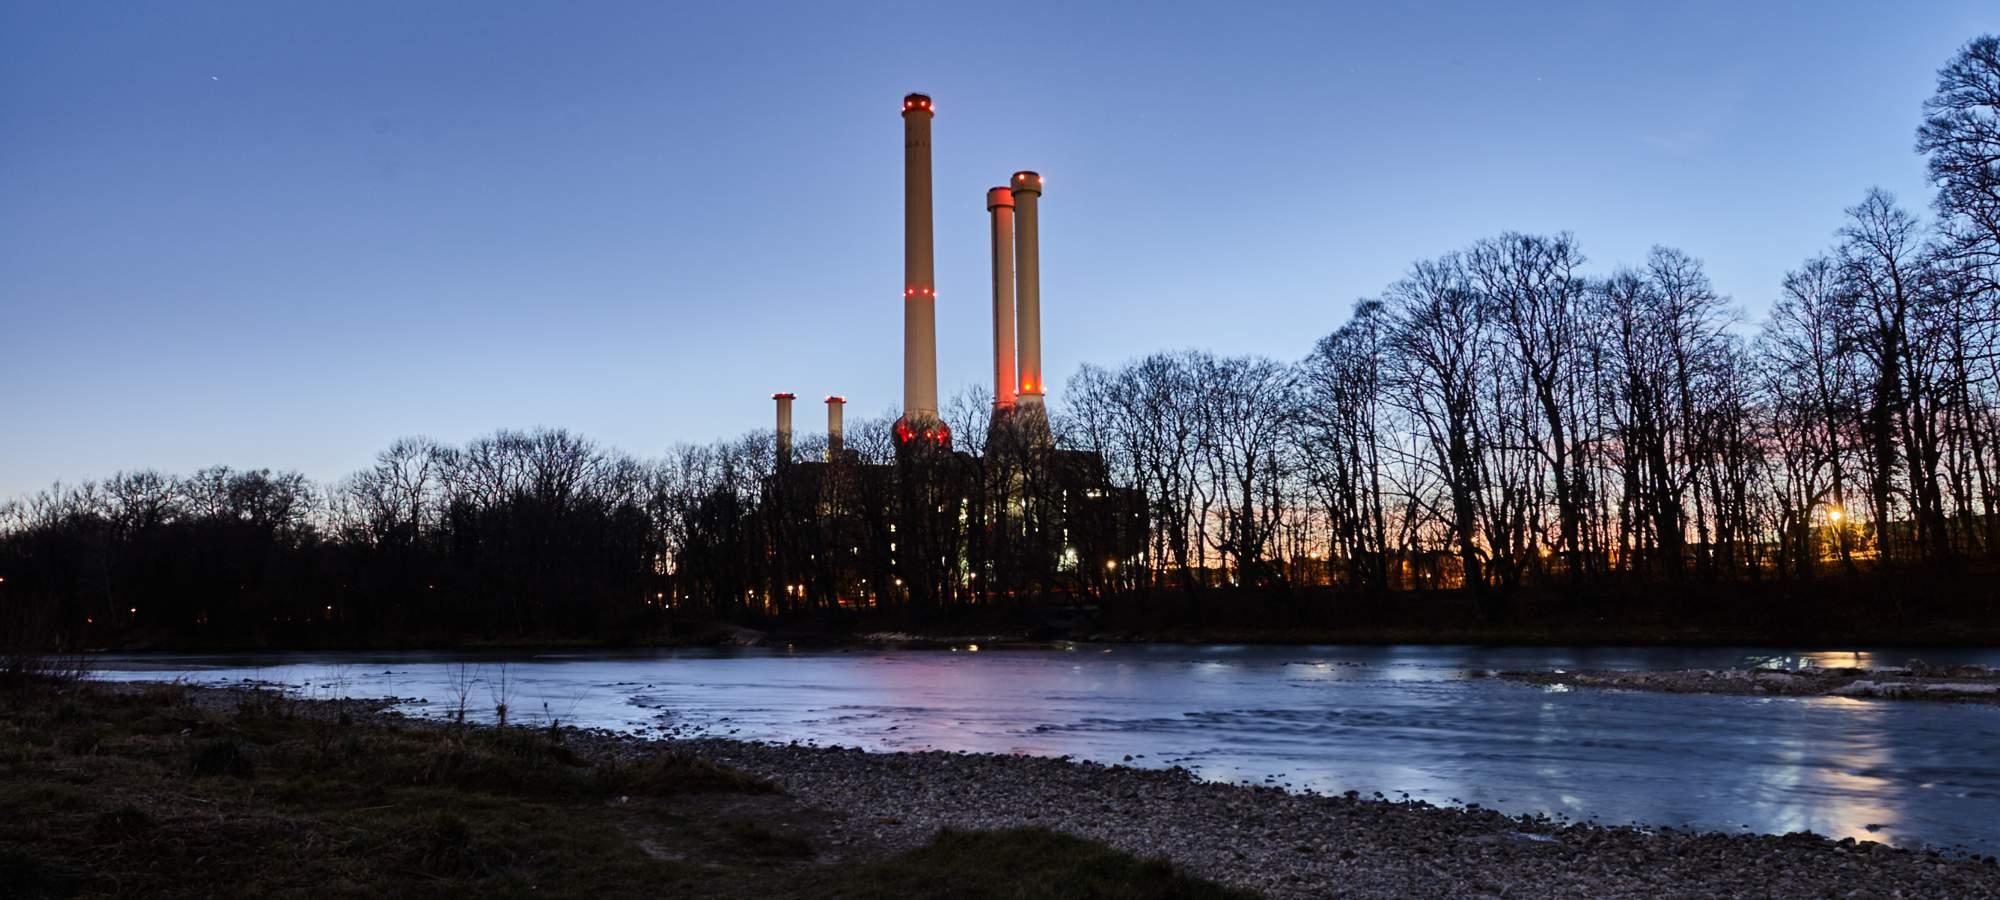 Heizkraftwerk-Fluss